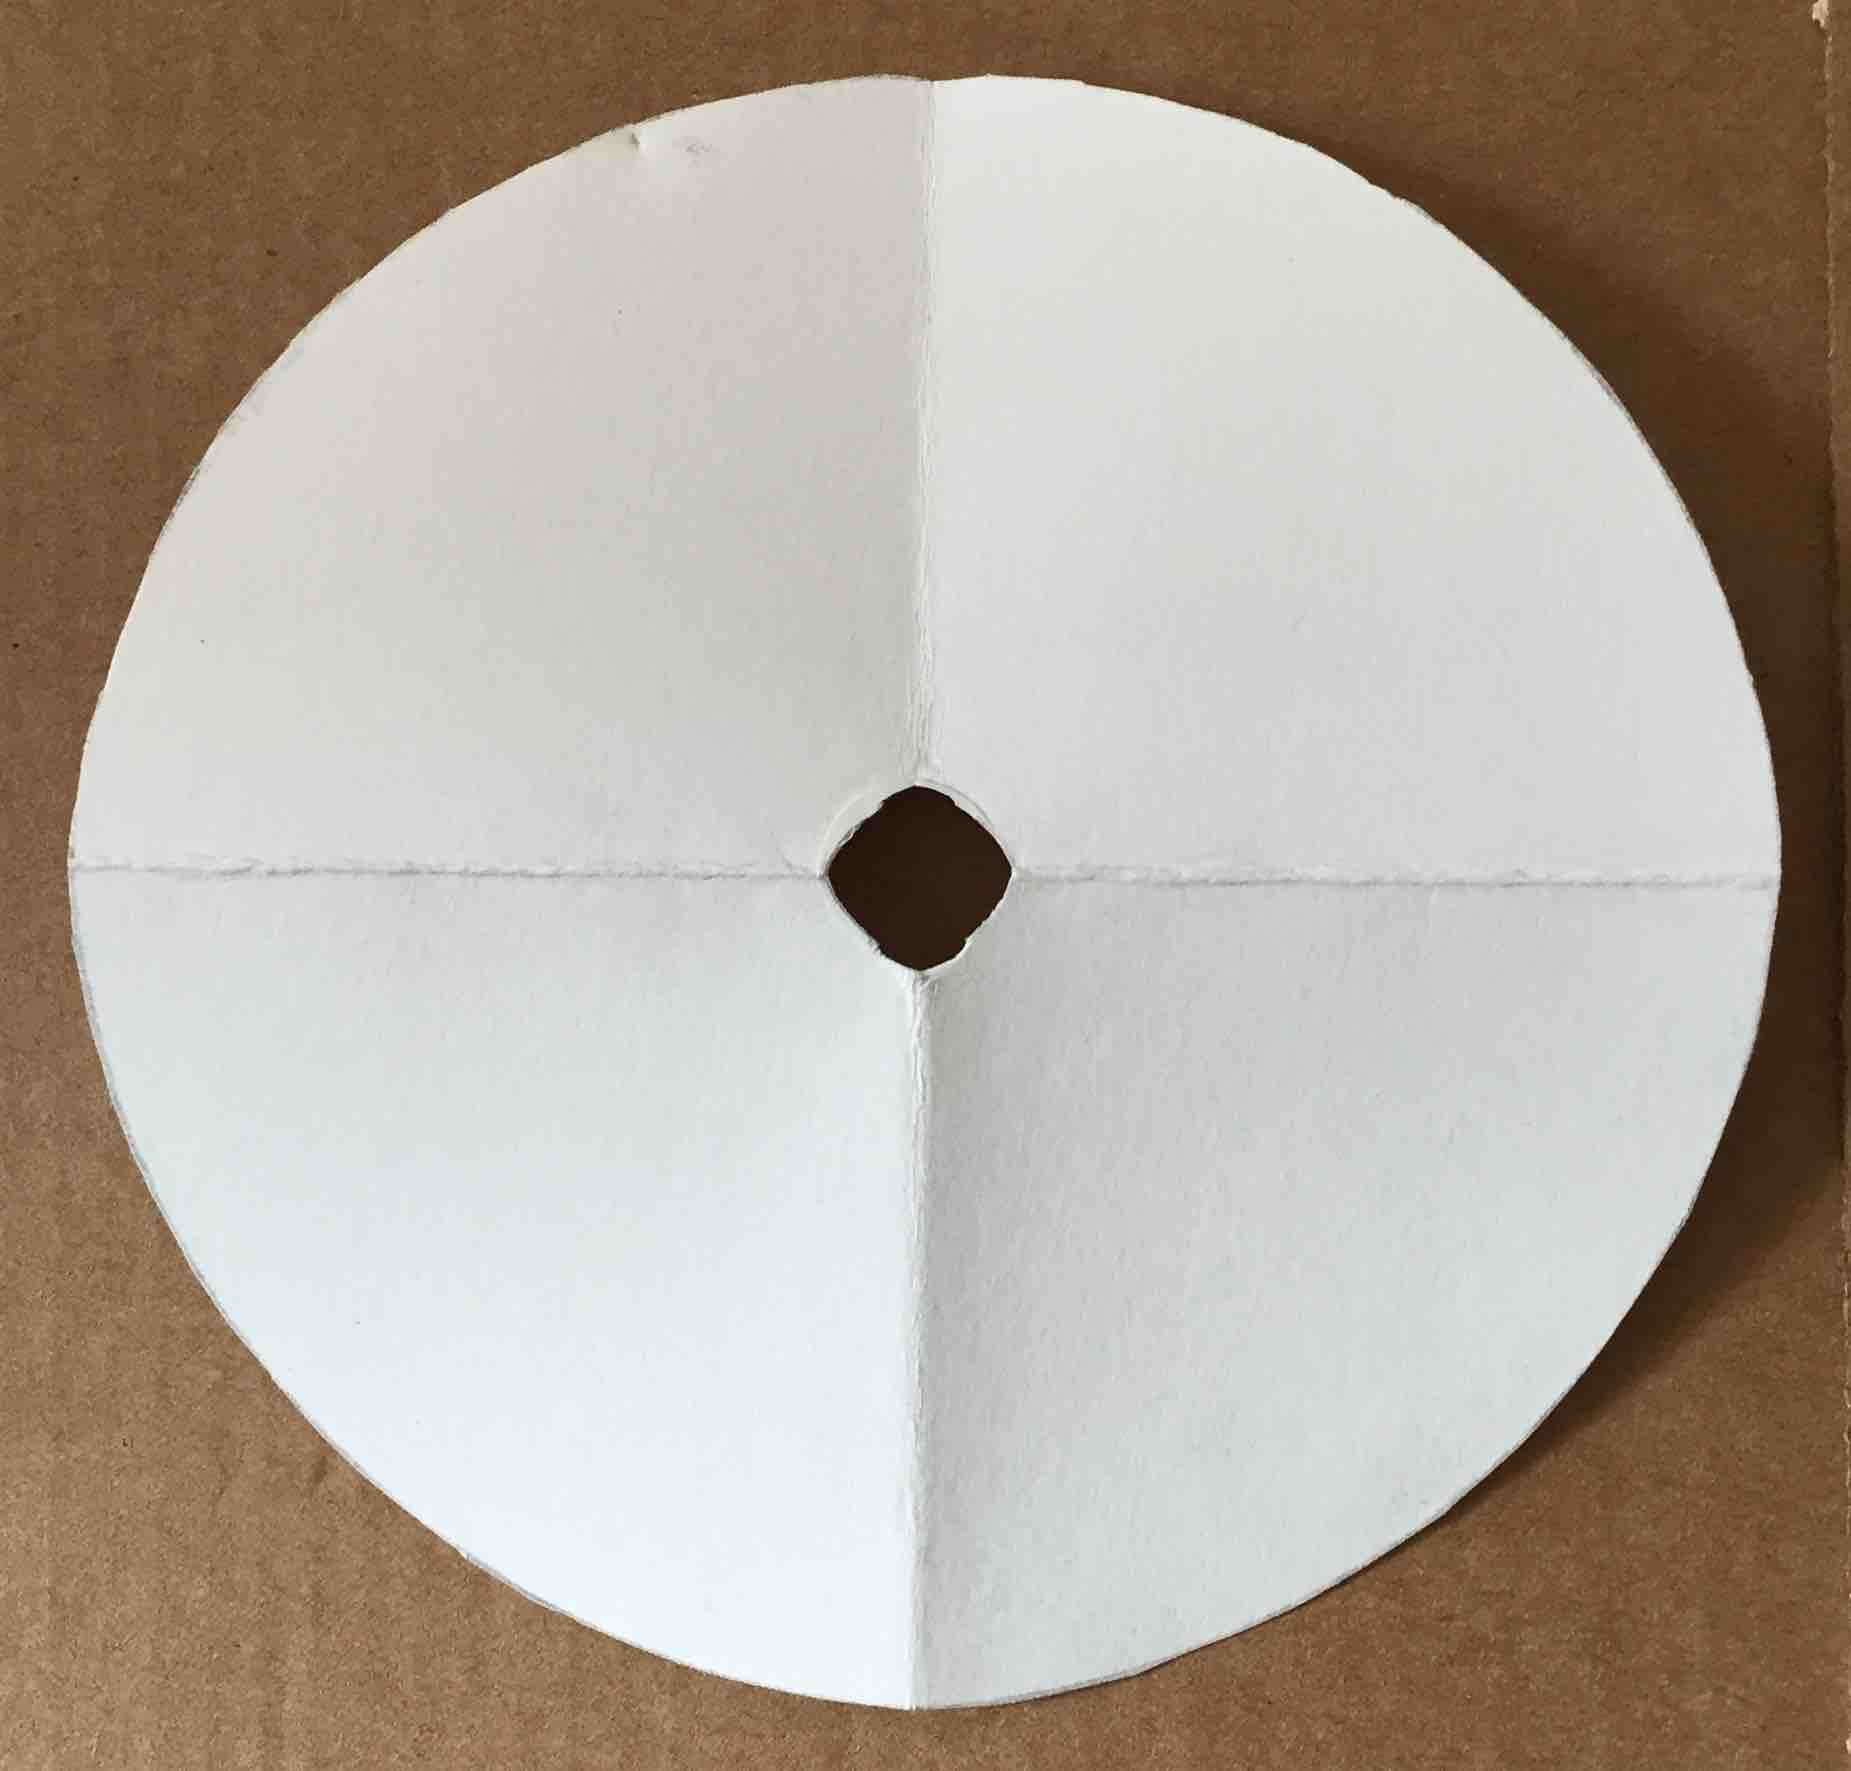 cercle.jpg.9378d791cf1e94907e42ee474be65973.jpg